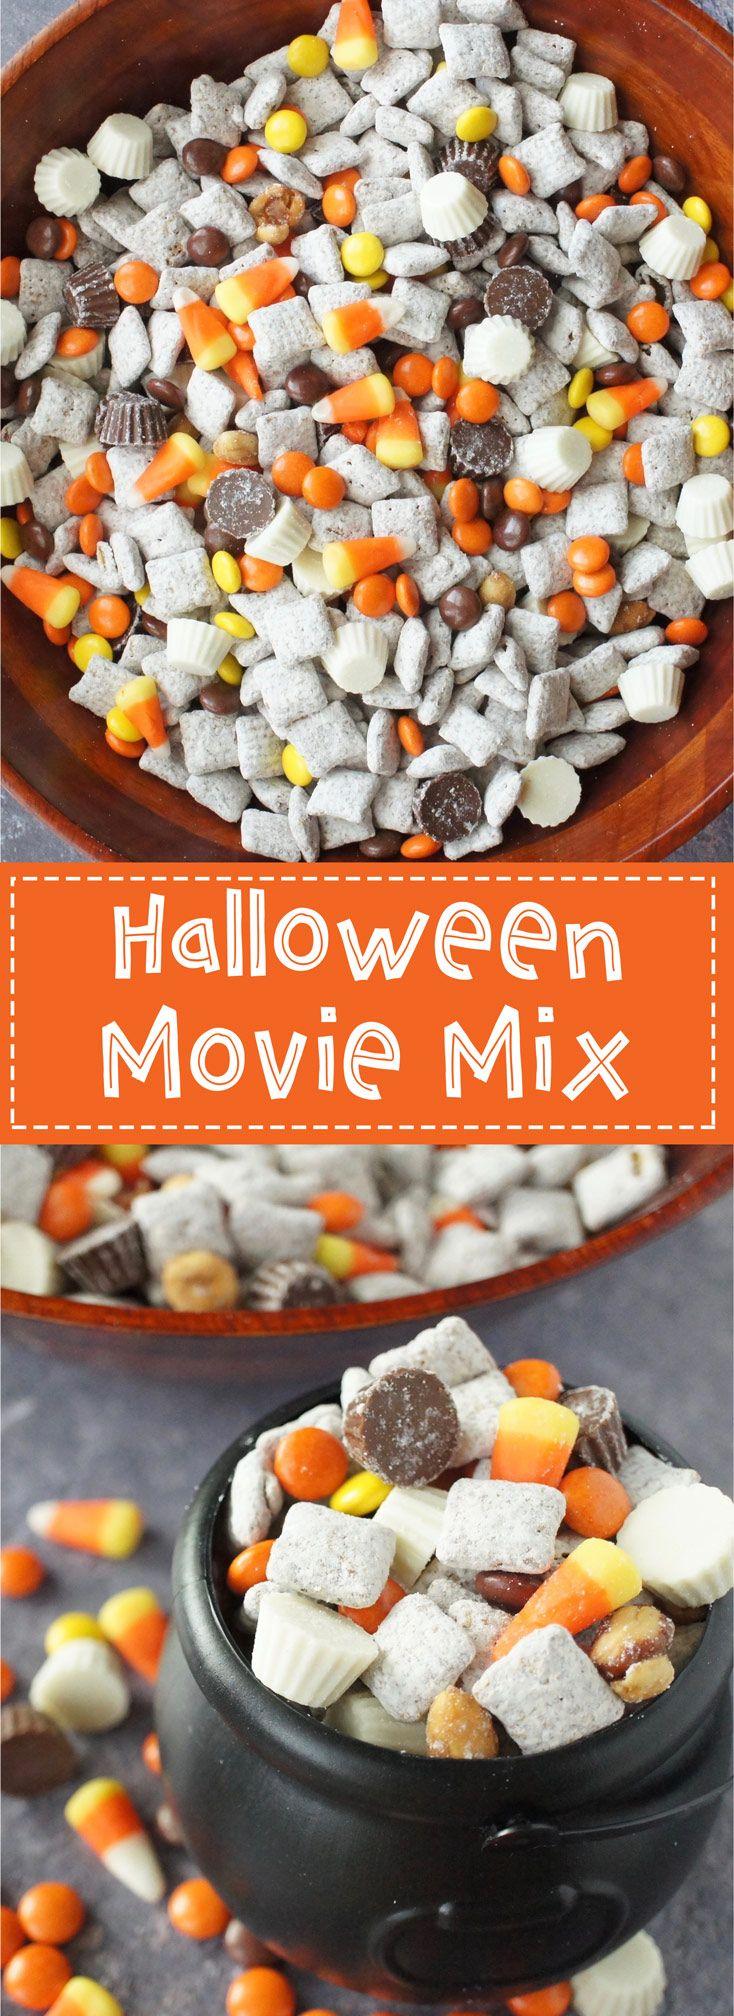 Best 25+ Fall snack mixes ideas on Pinterest | Fall snacks ...